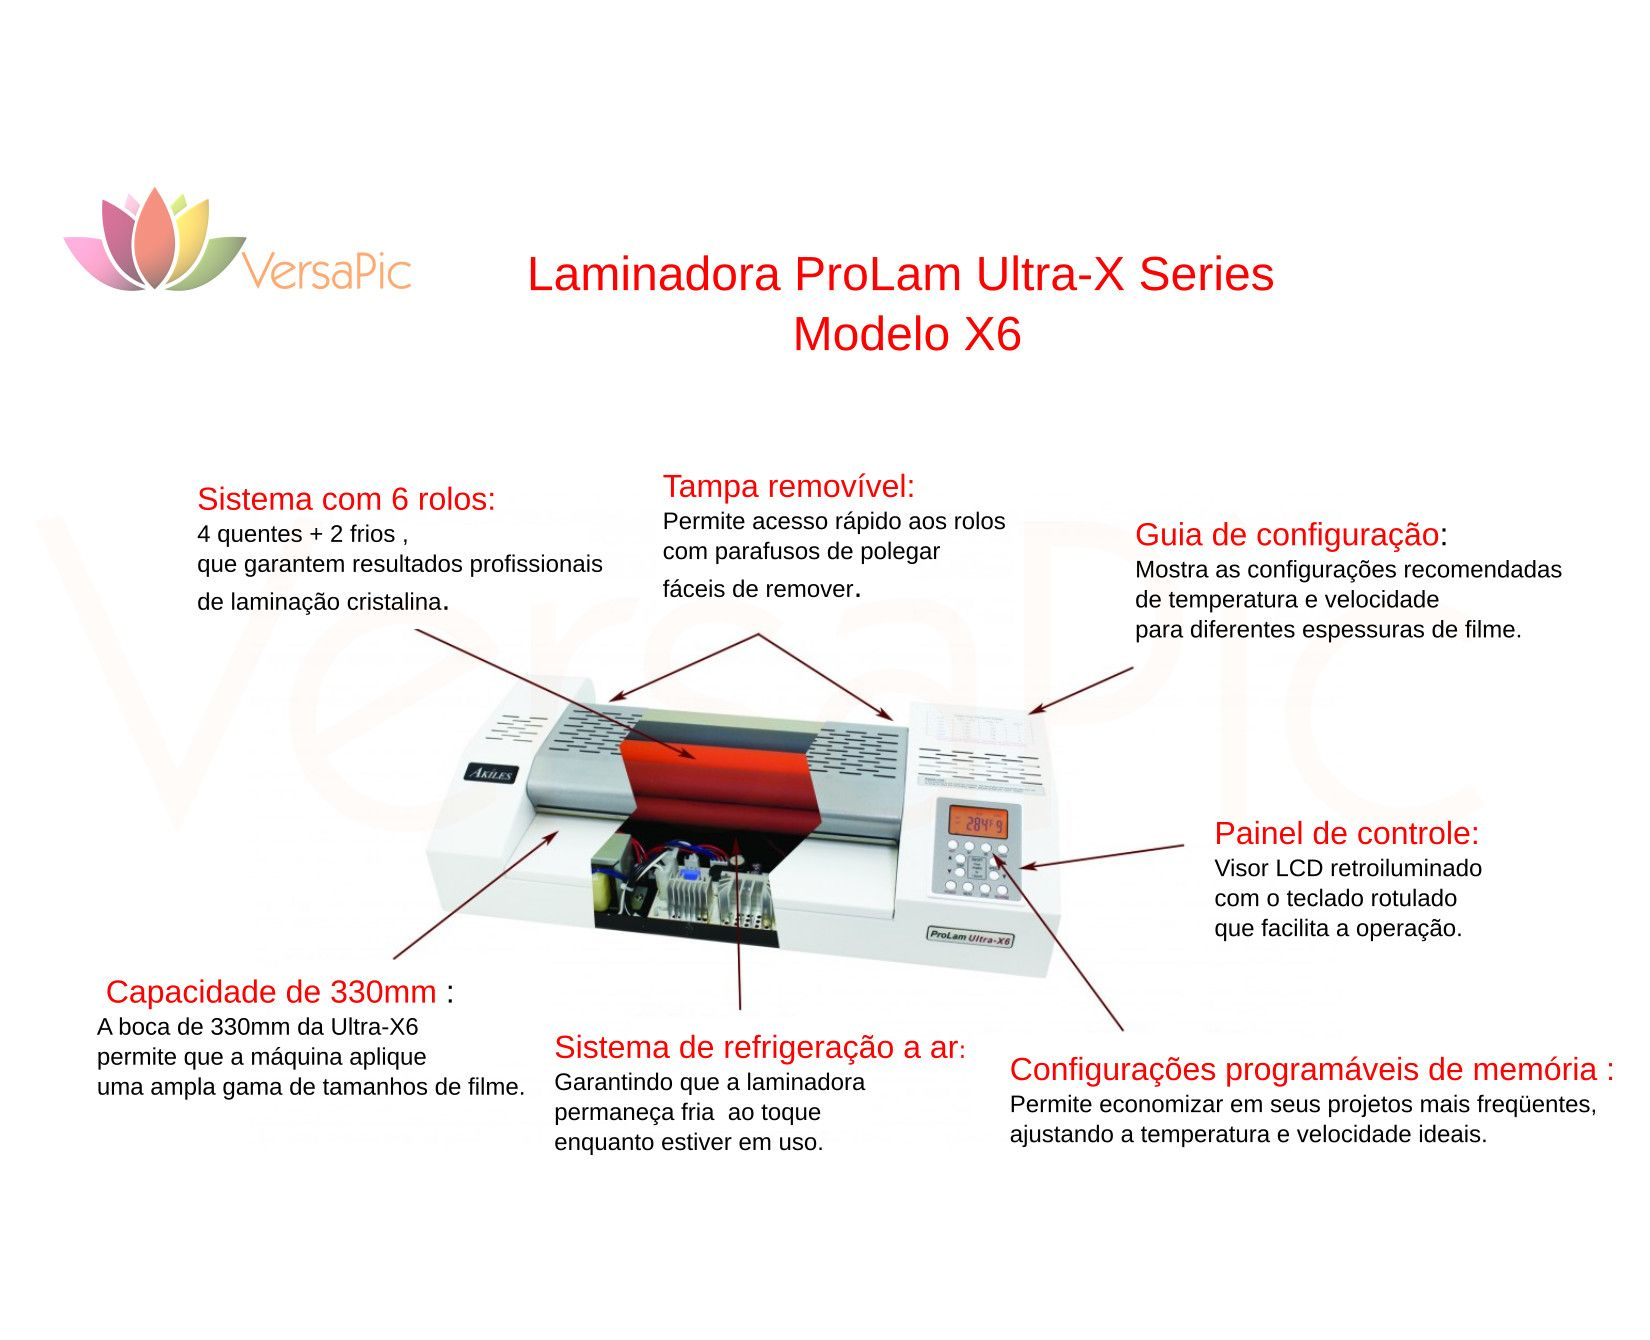 Laminadora Plastificadora 6 Rolos A3 Polaseal Comercial/Industrial  para Alta Produção